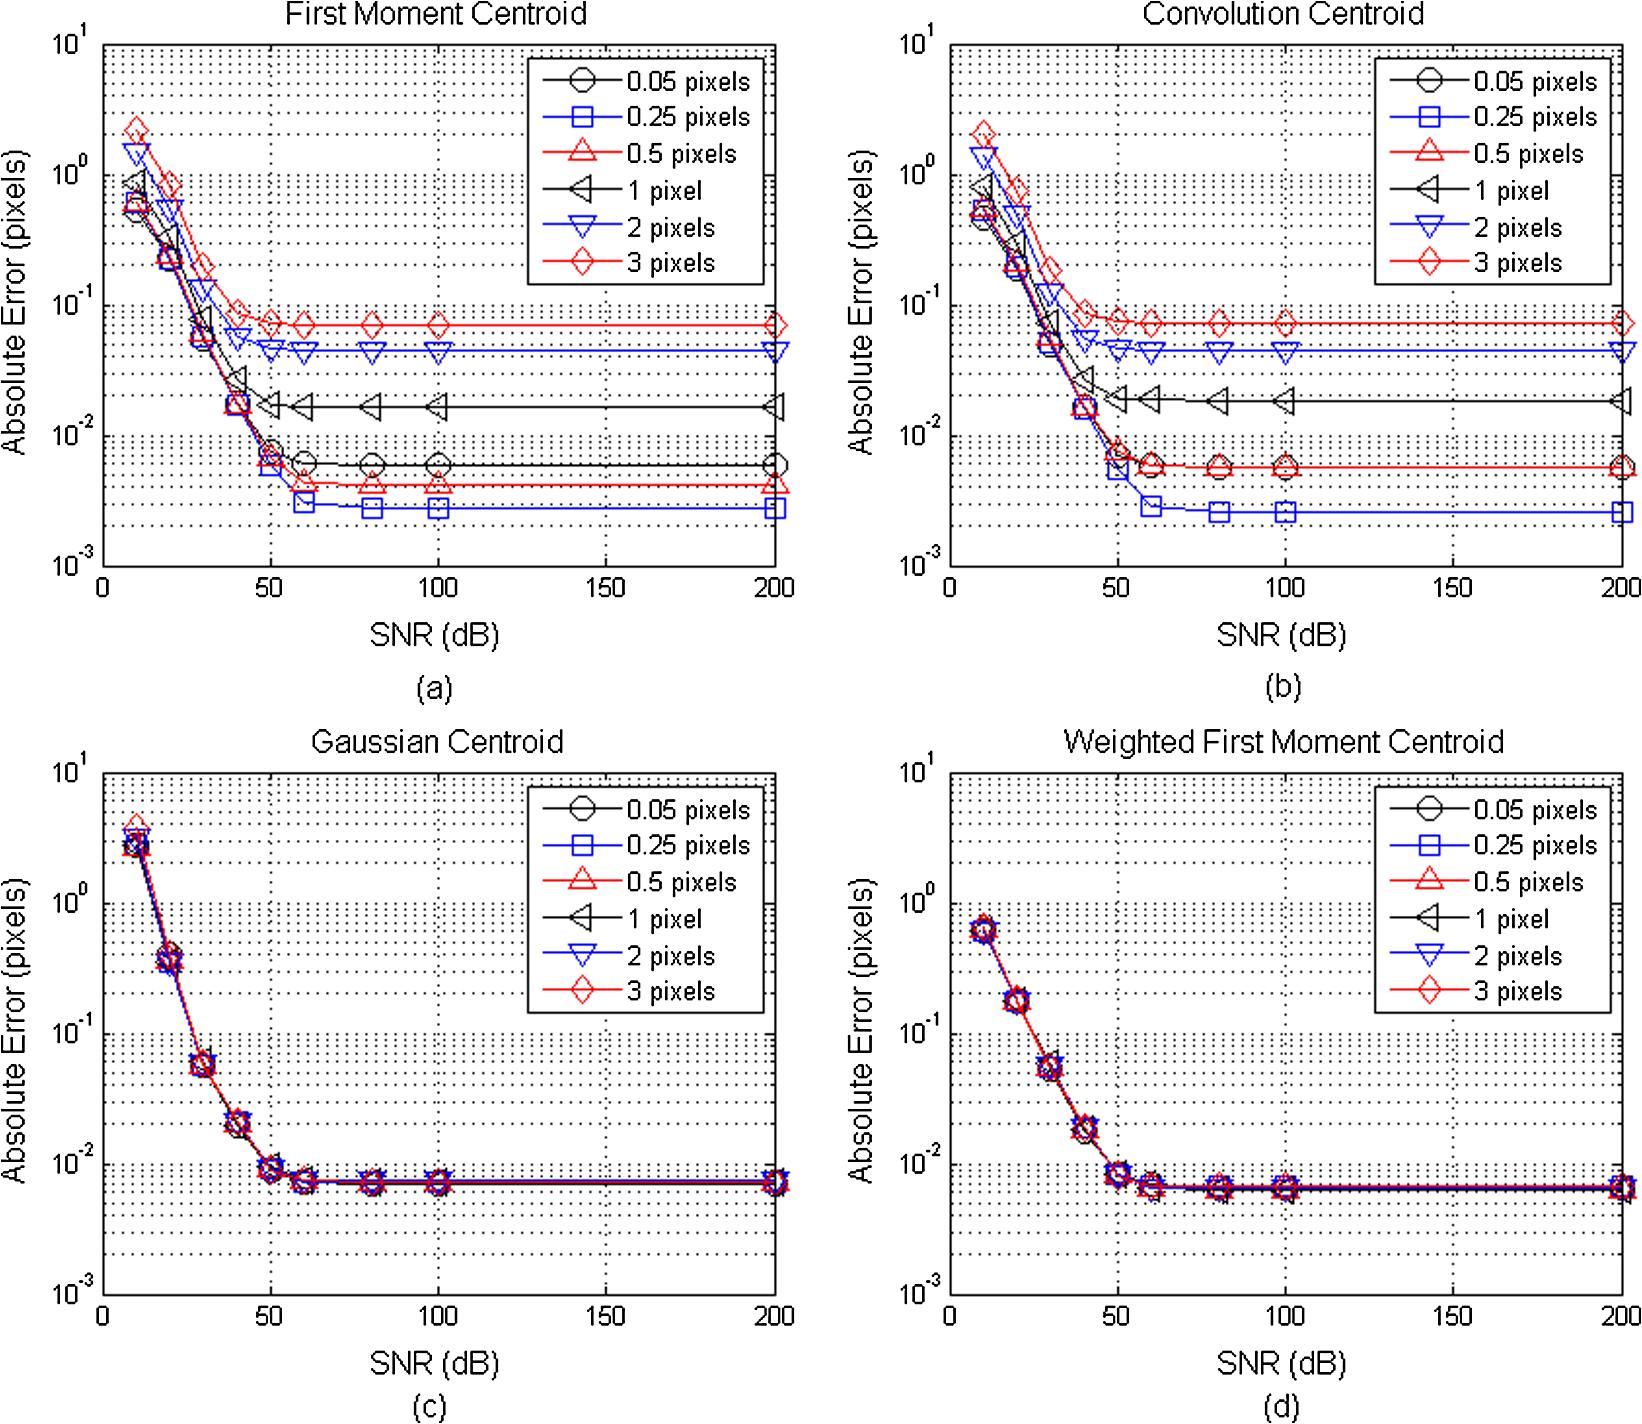 Shack-Hartmann wavefront sensor image analysis: a comparison